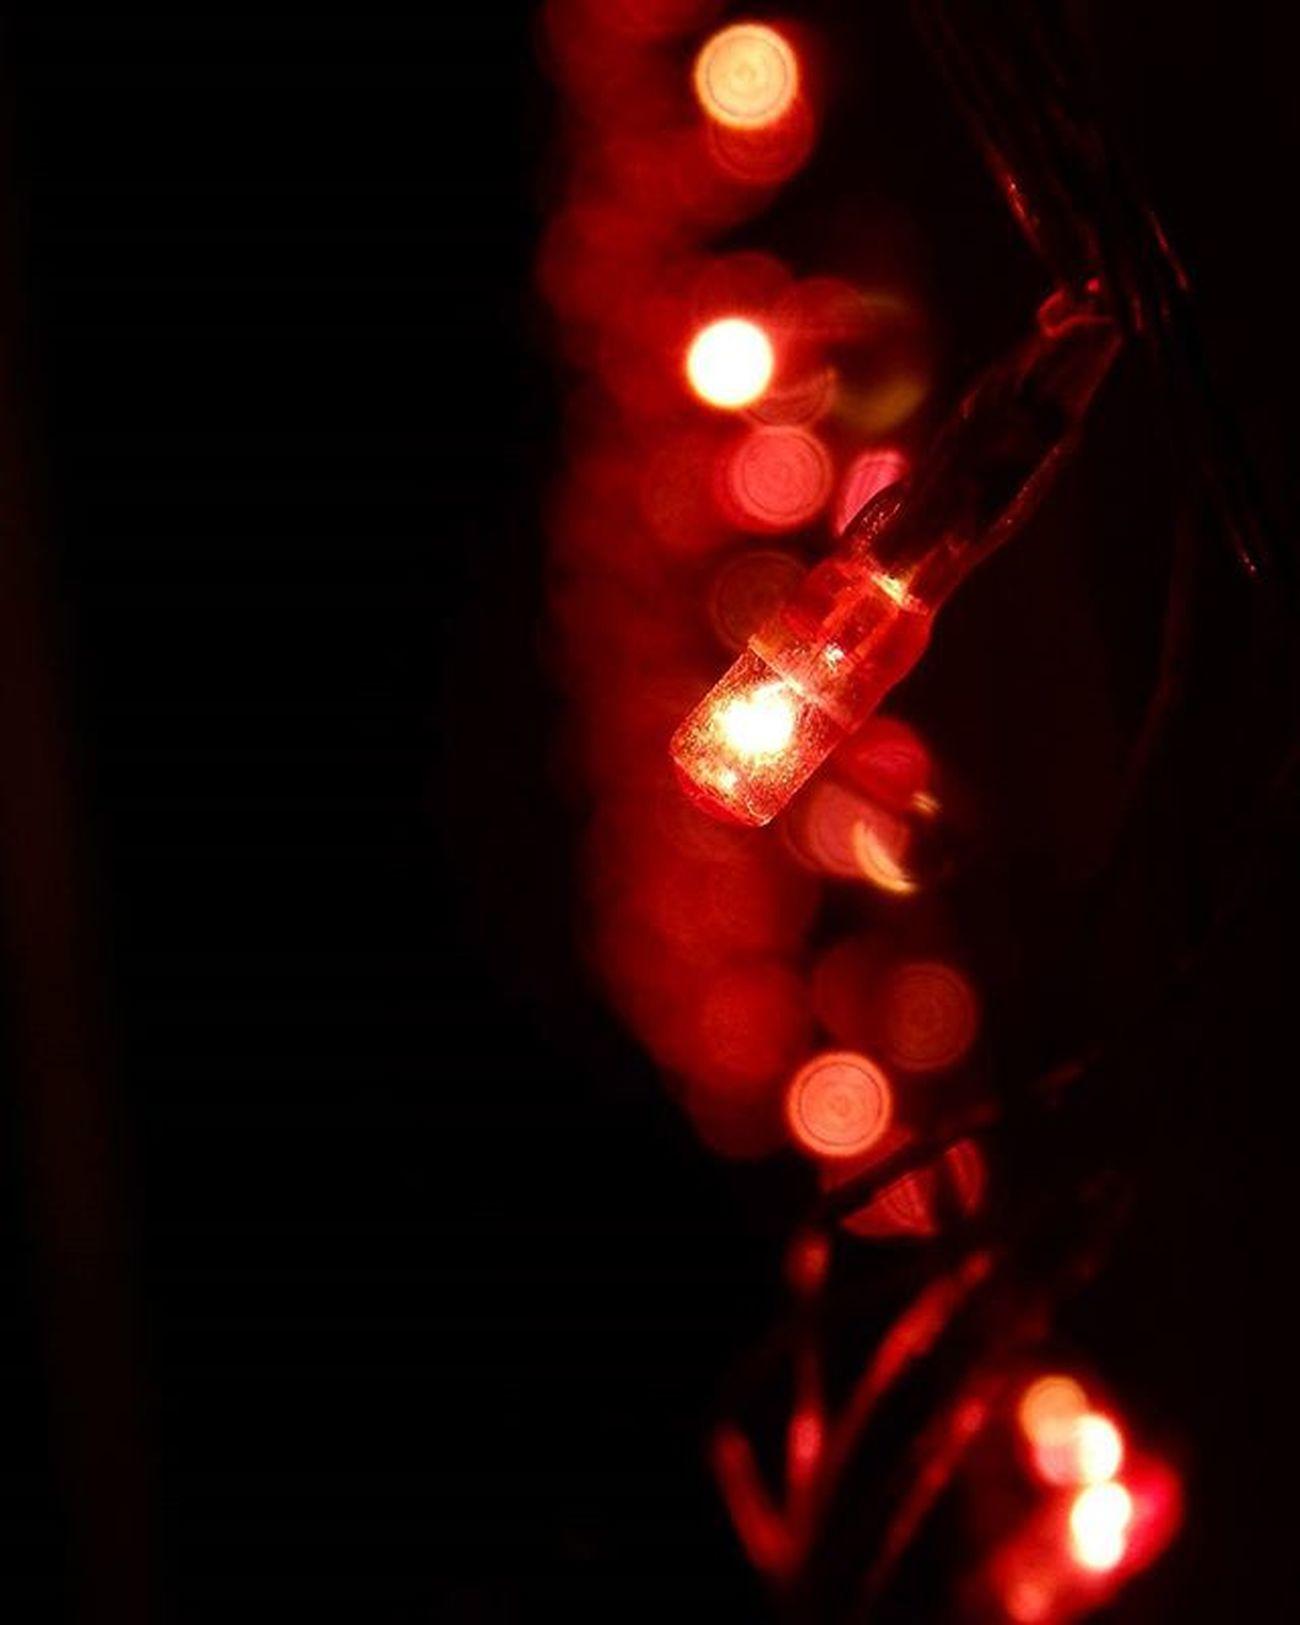 Bokeh Diwali 2014 Throwback Night_randoms Macro Focused Nikonphotography Nikon_photographs L820 Nikontop Oldone Photography_love Photographyislife Instadaily Photographybros